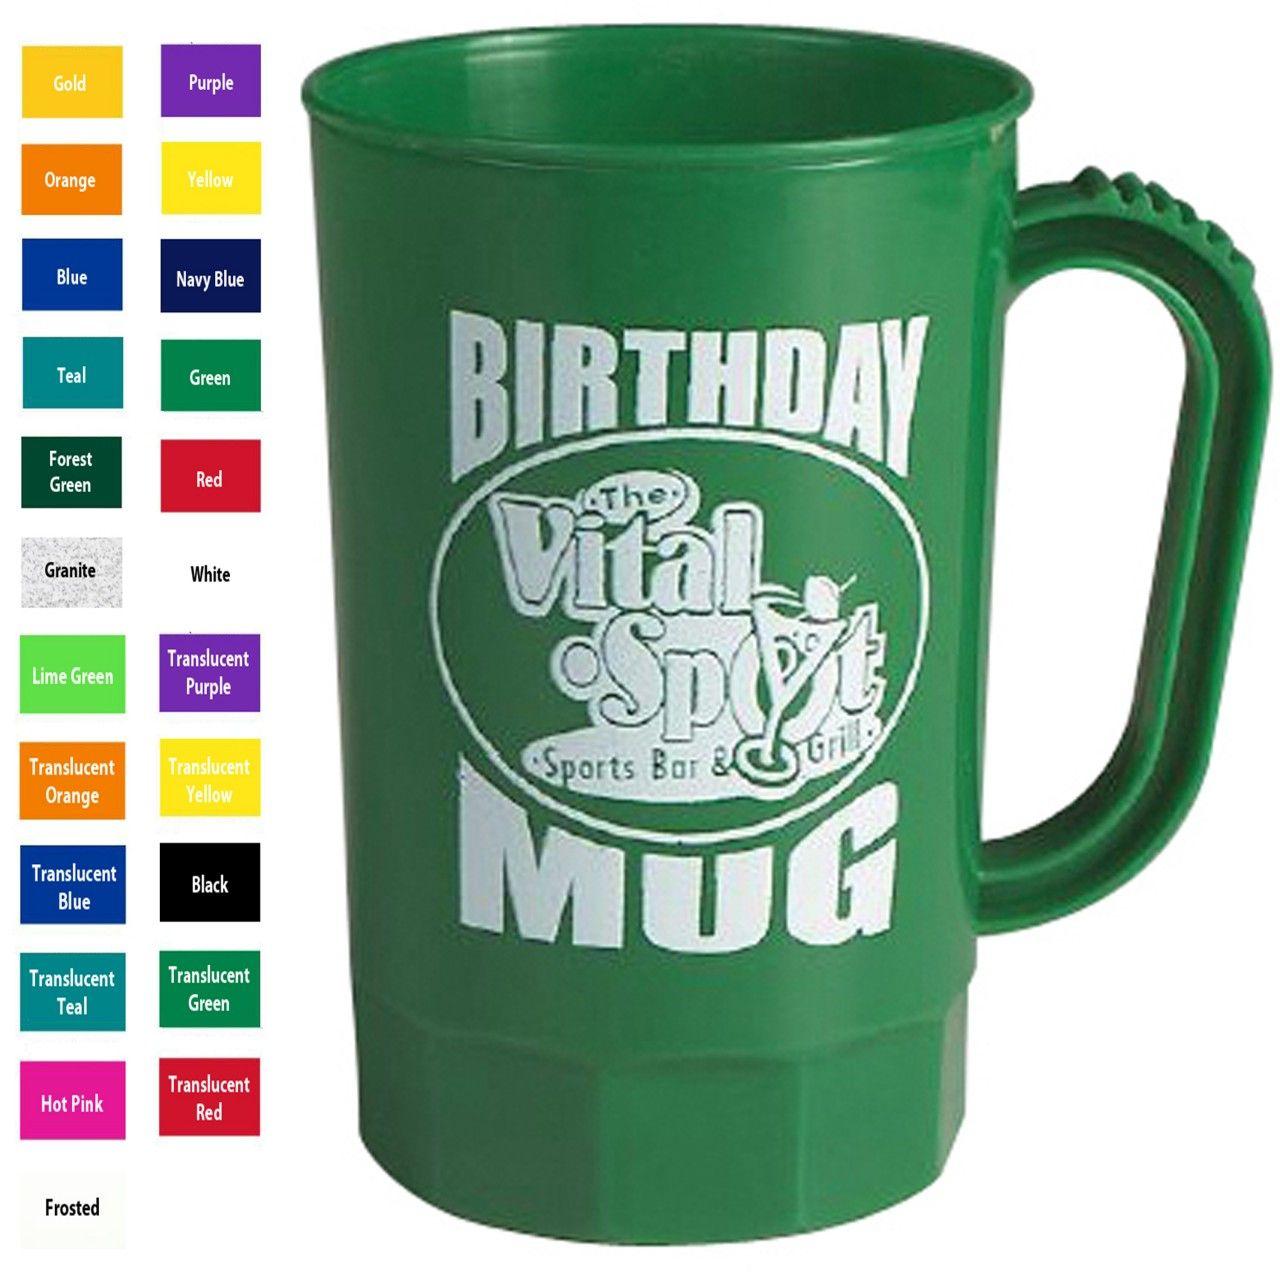 Custom plastic coffee mug with handle, Dustin (dustincy